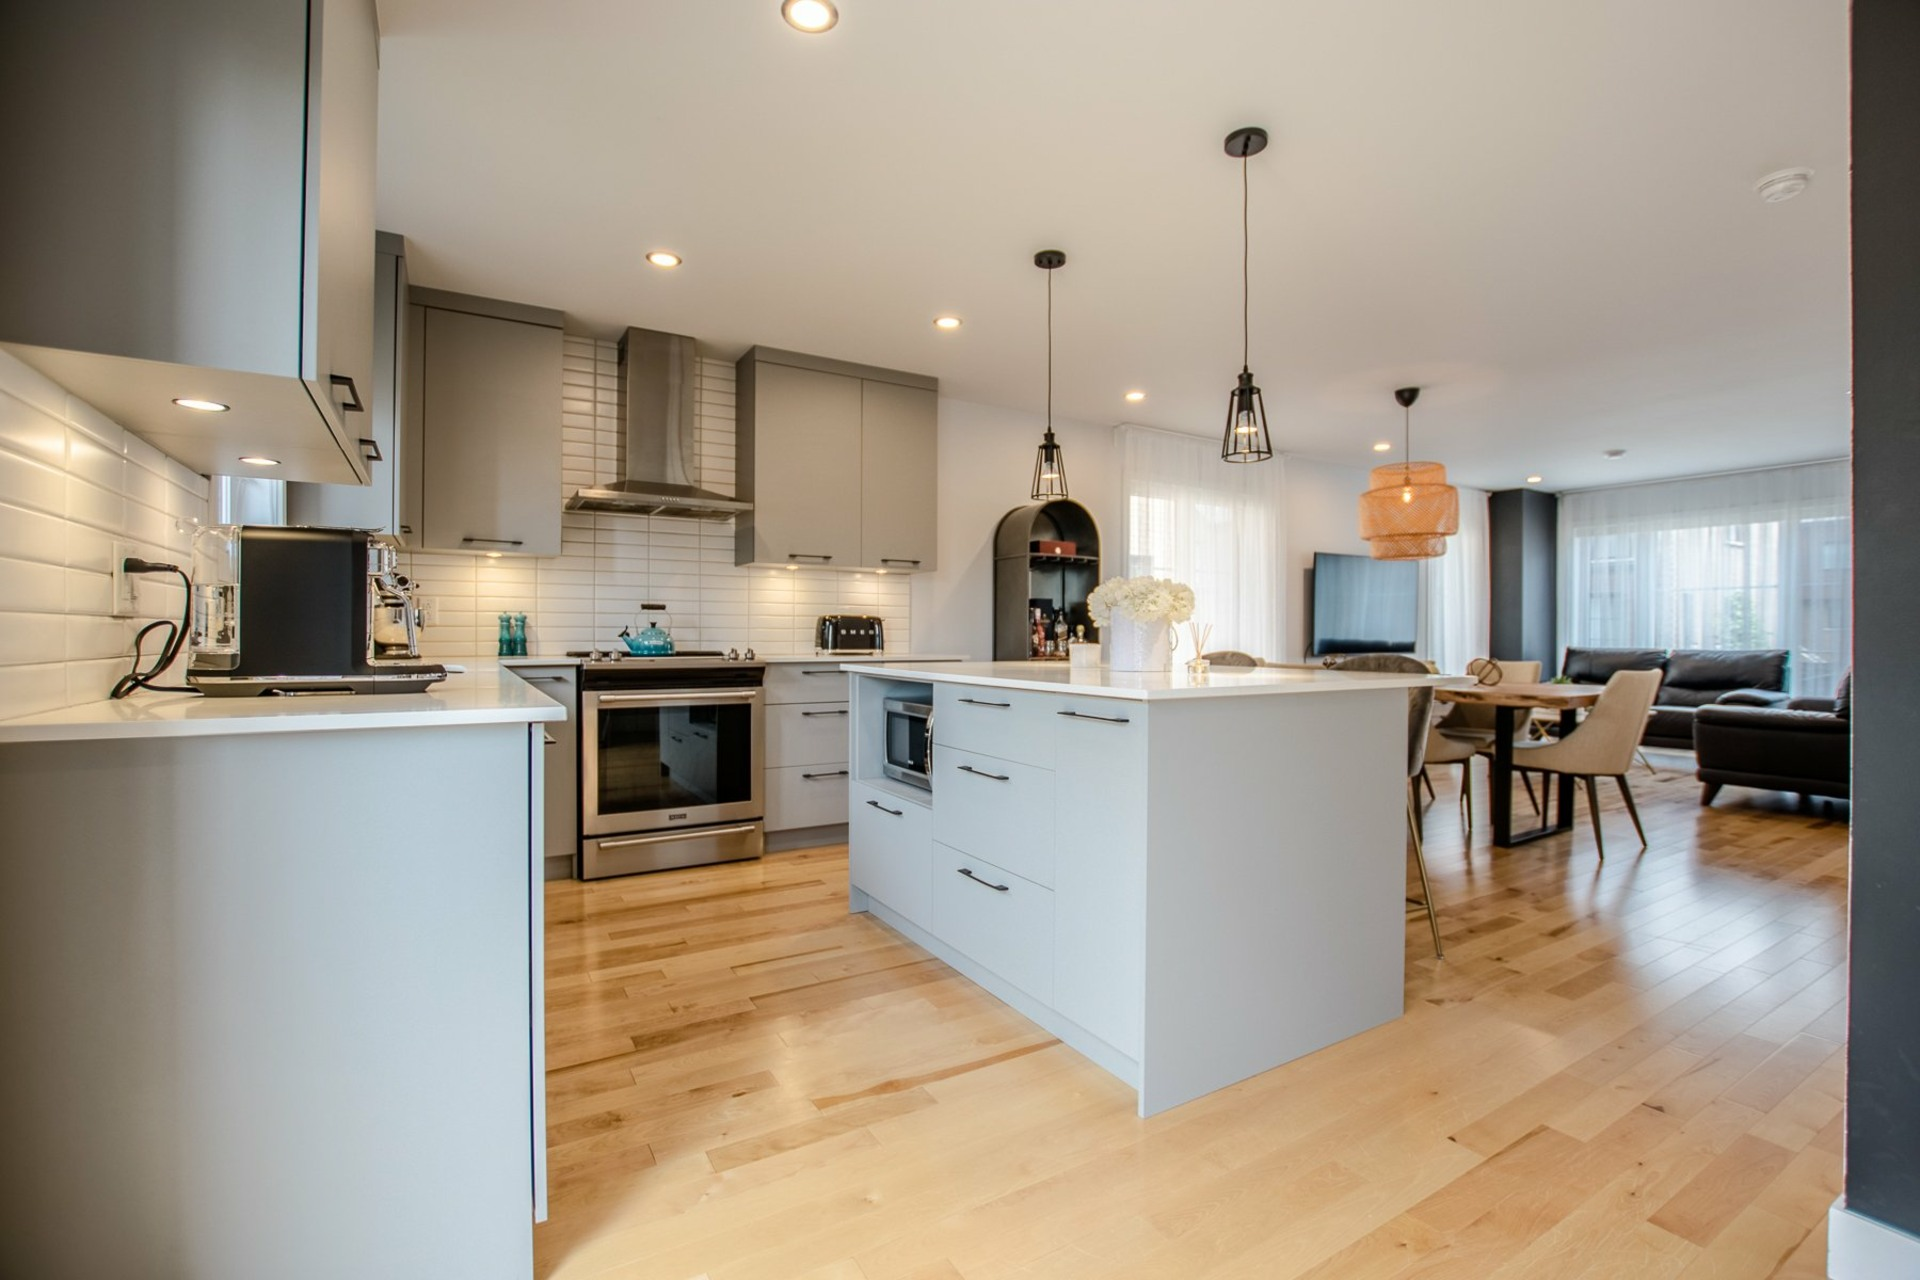 image 3 - MX - Casa sola - MX En venta Saint-Constant - 10 habitaciones